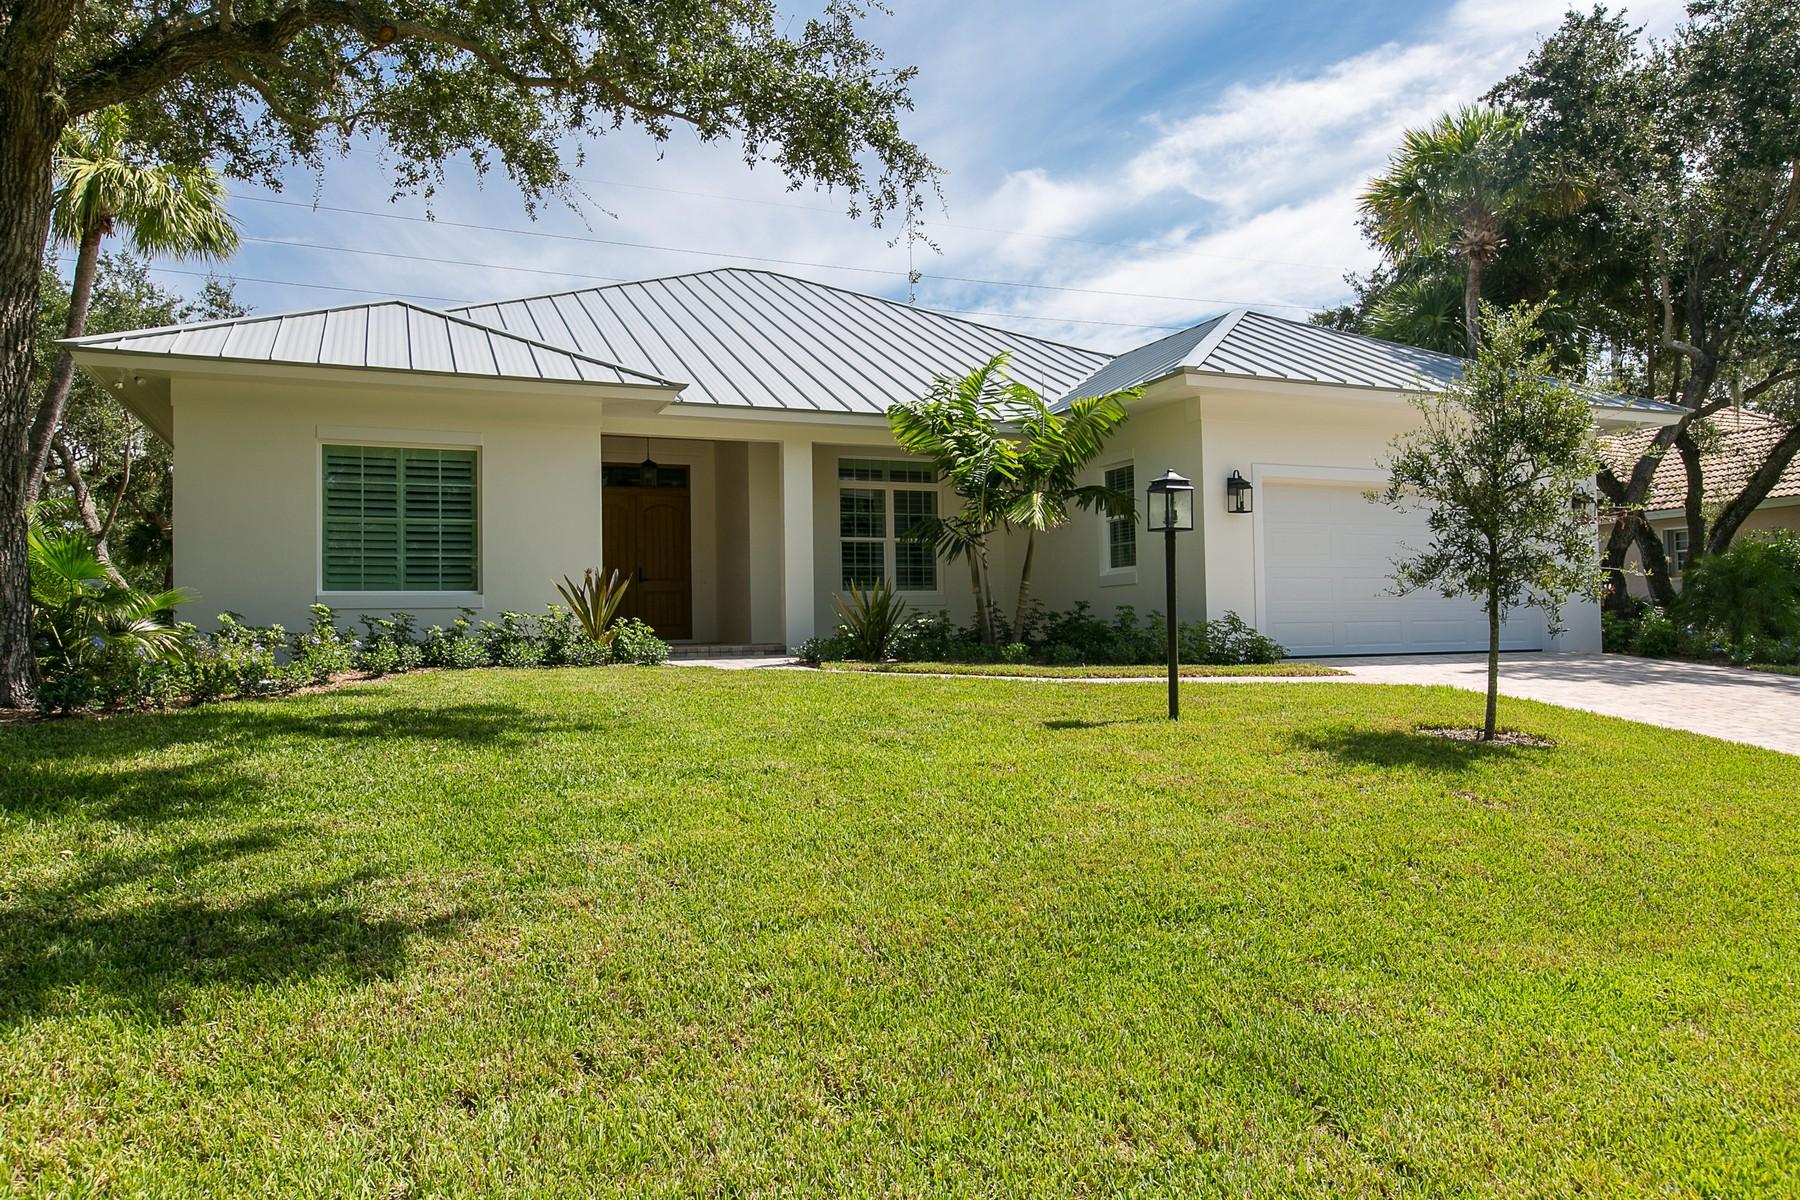 Casa Unifamiliar por un Venta en To be Constructed Home on Corner in Golf Course Community 5700 Glen Eagle Lane Vero Beach, Florida, 32967 Estados Unidos